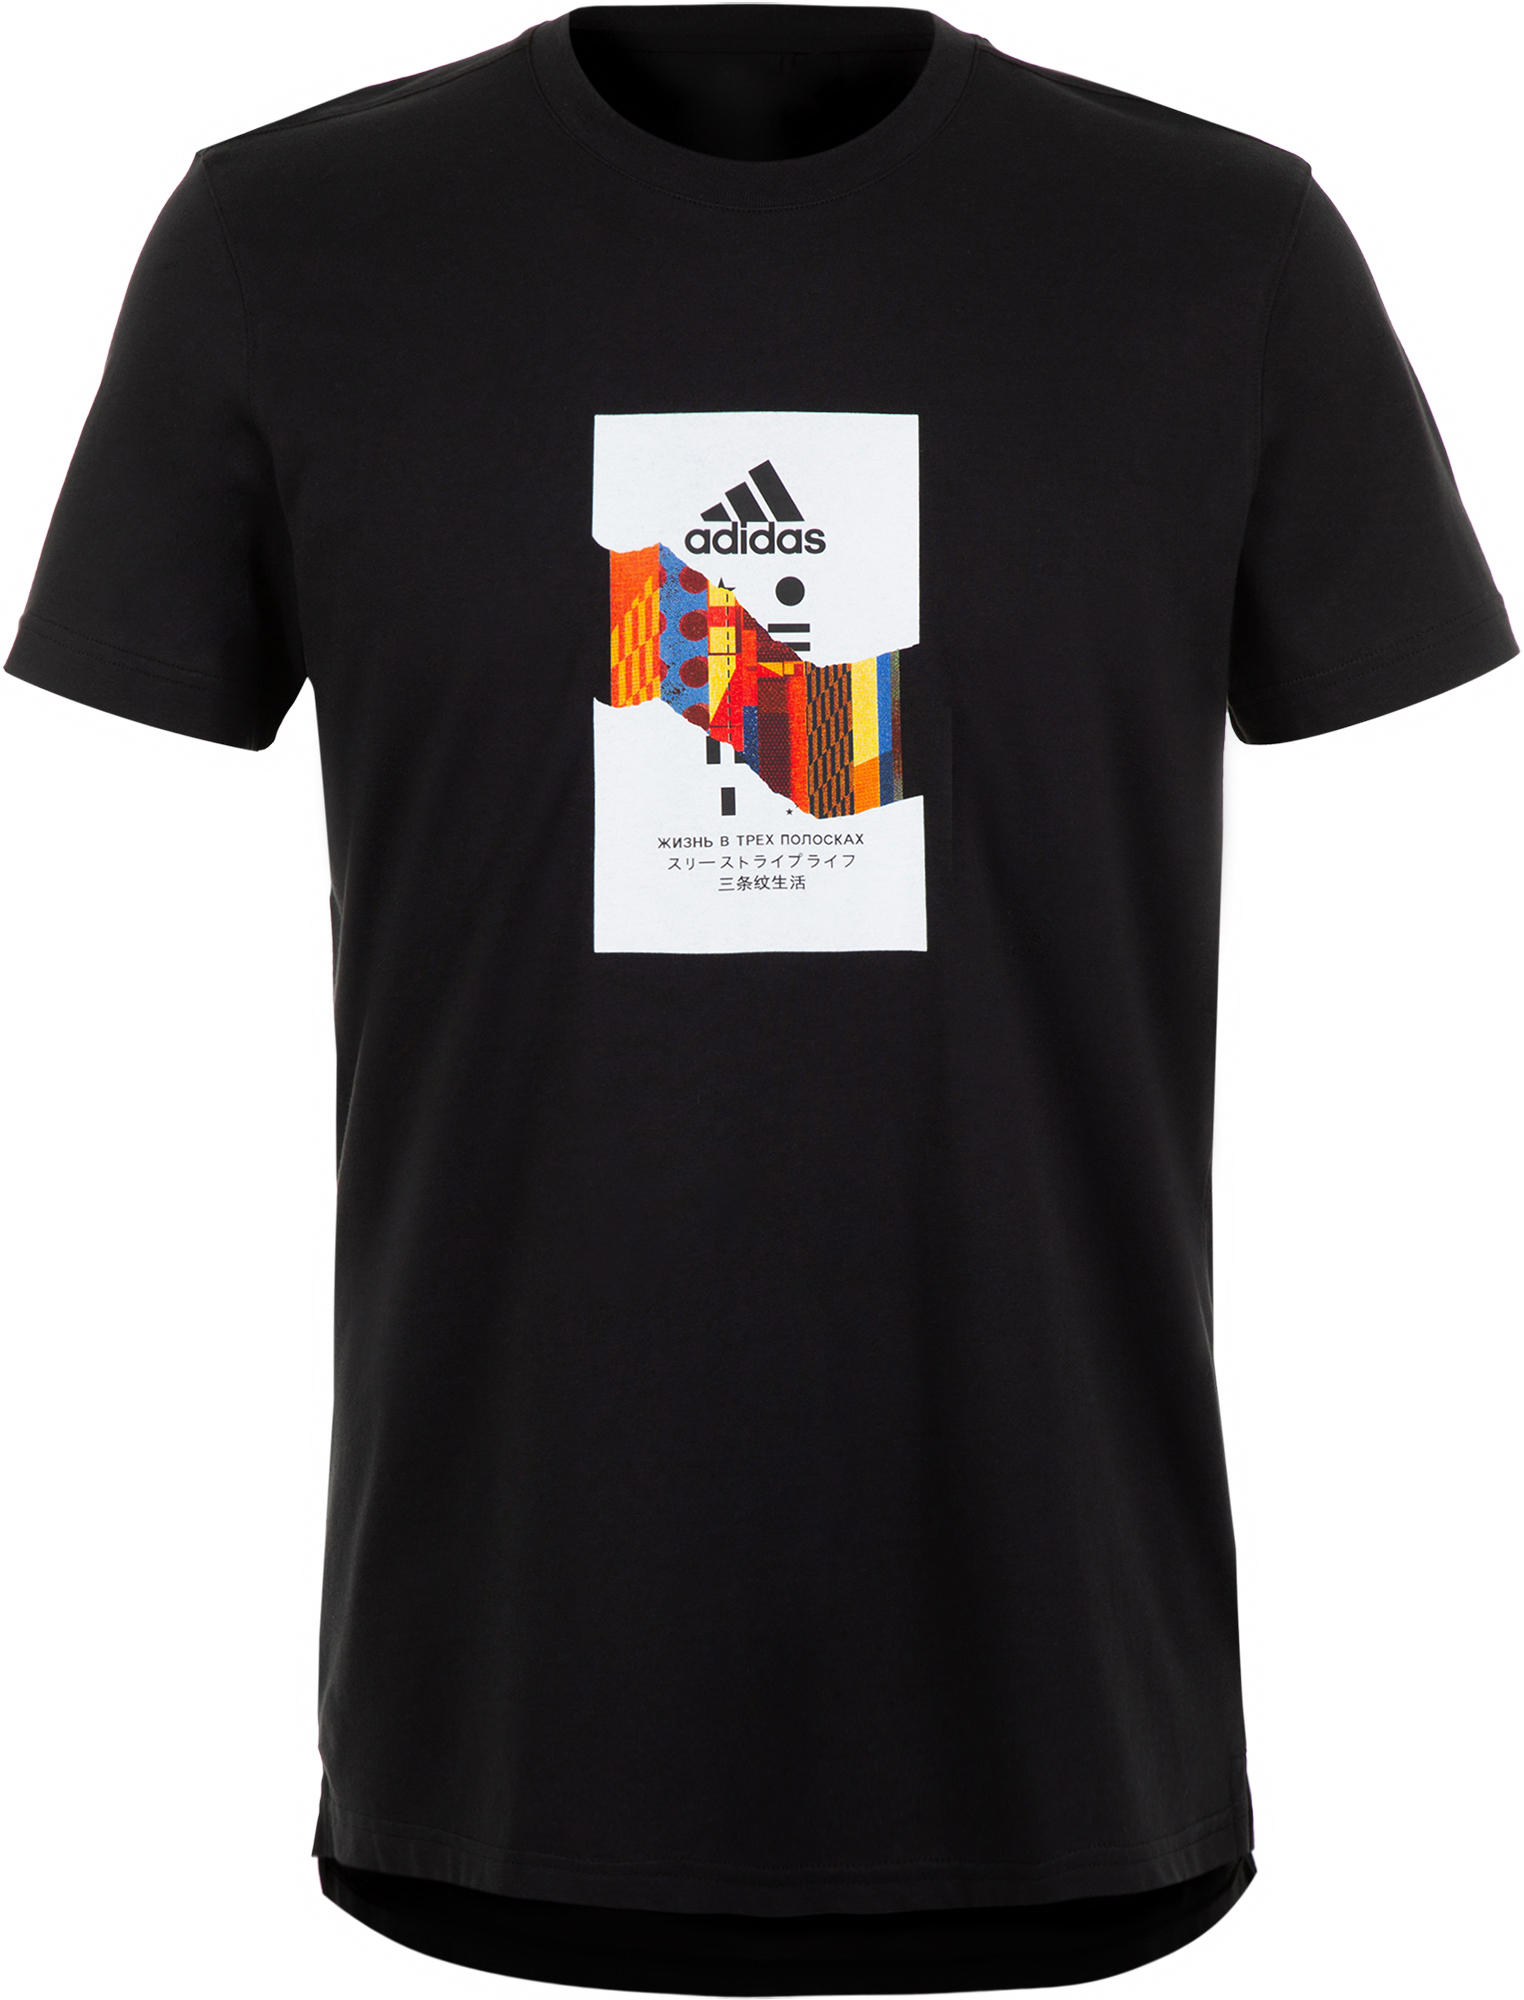 Adidas Футболка мужская Adidas, размер 52